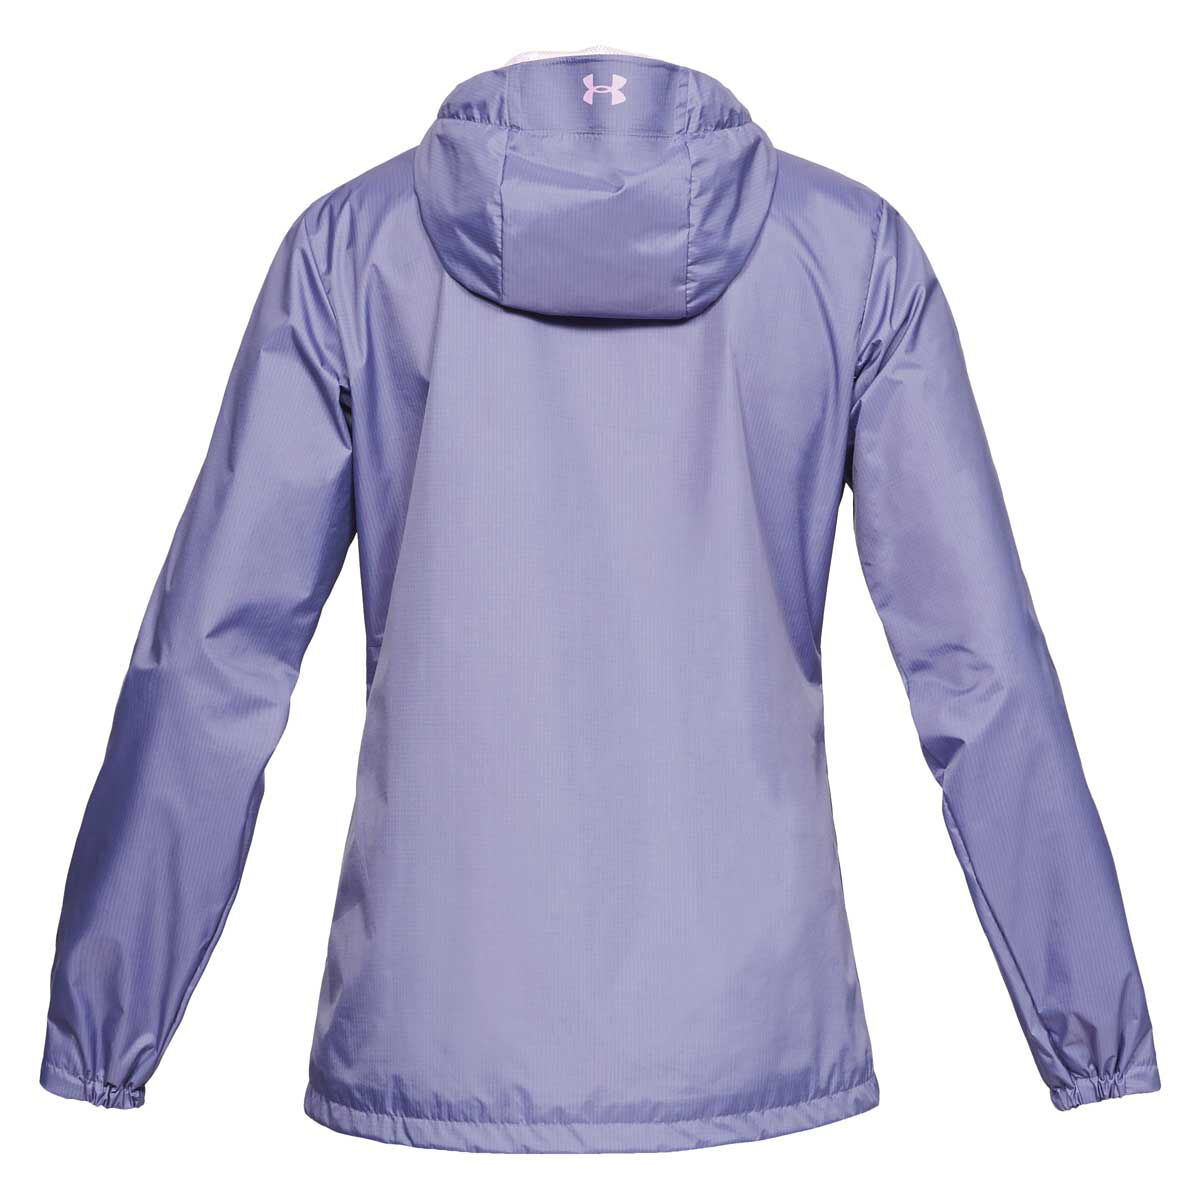 Running Rain Jacket Reviews Nike Womens Ultra Adidas Outdoor